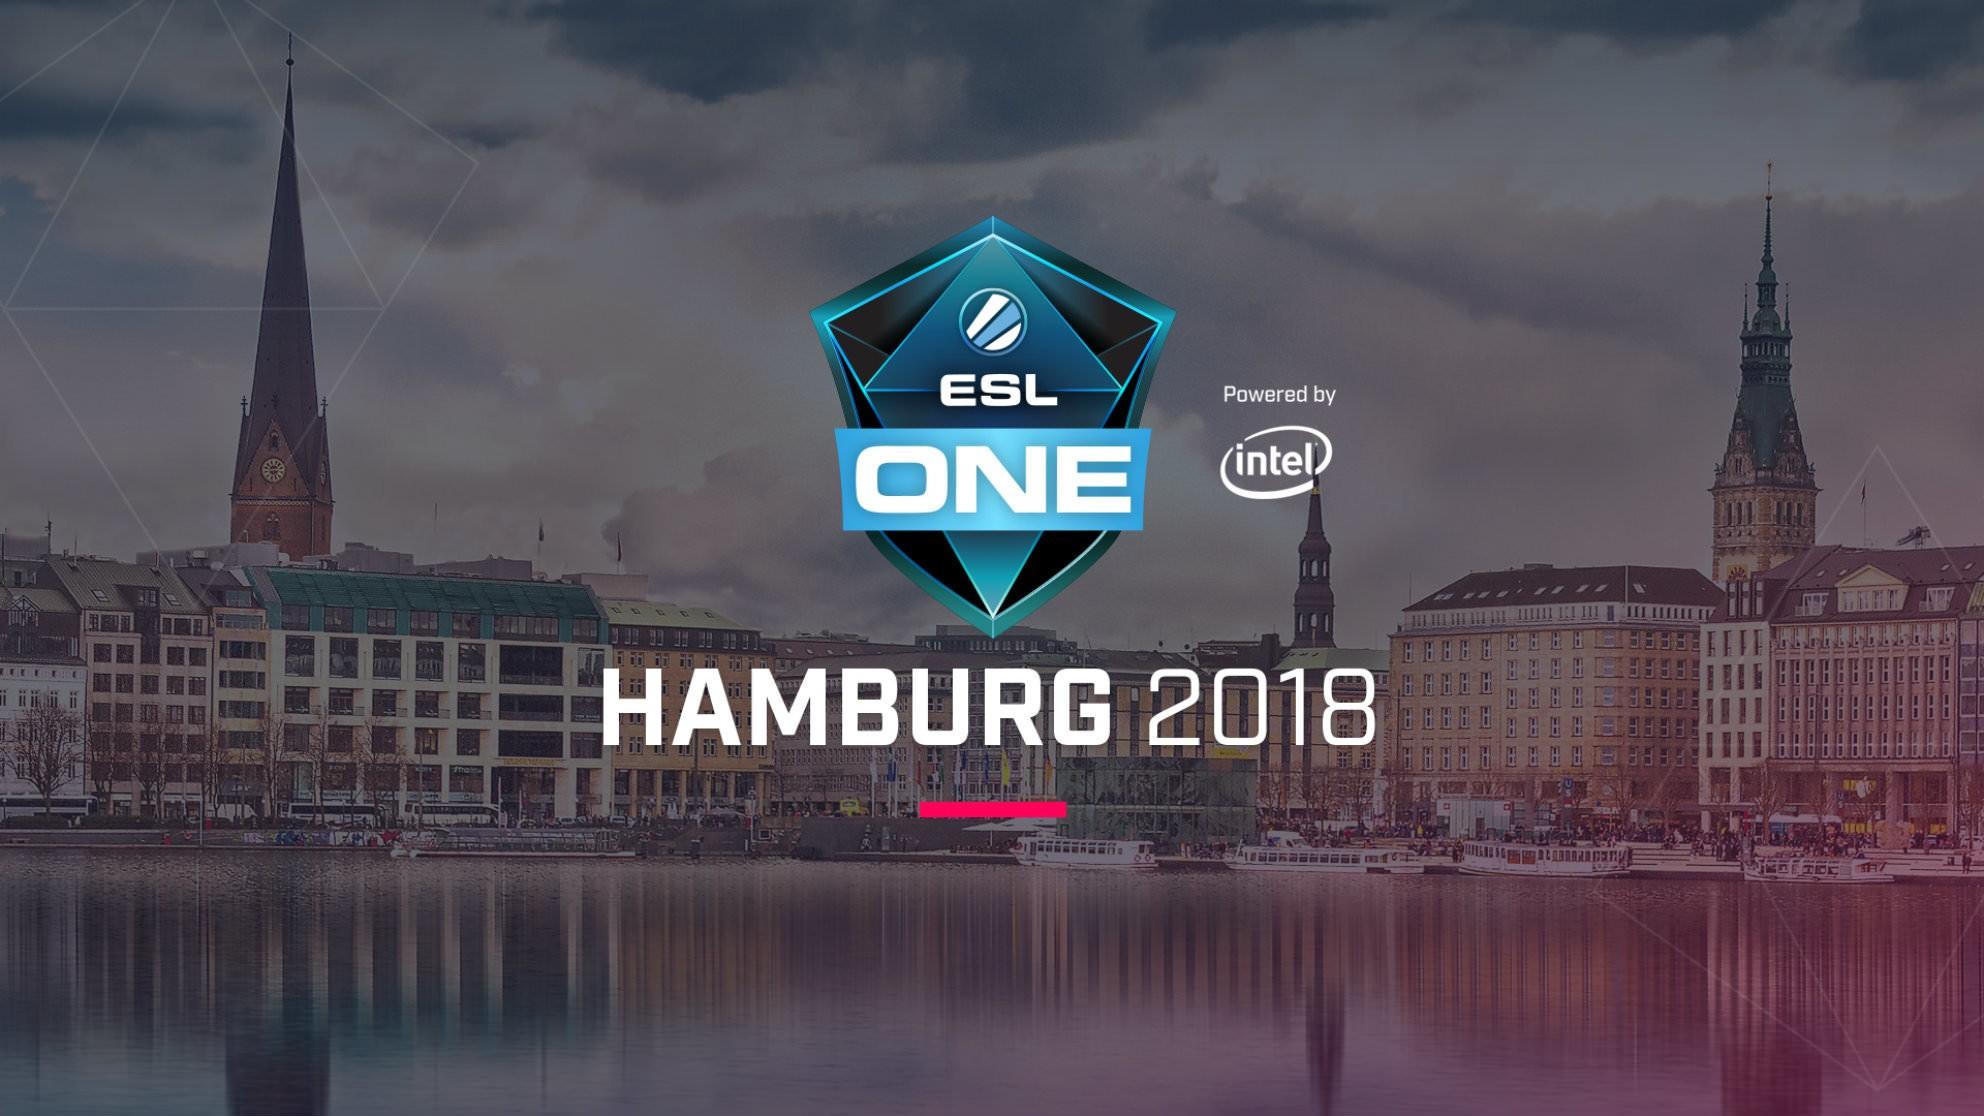 ESL One Hamburg 2018: Day 1 Recap